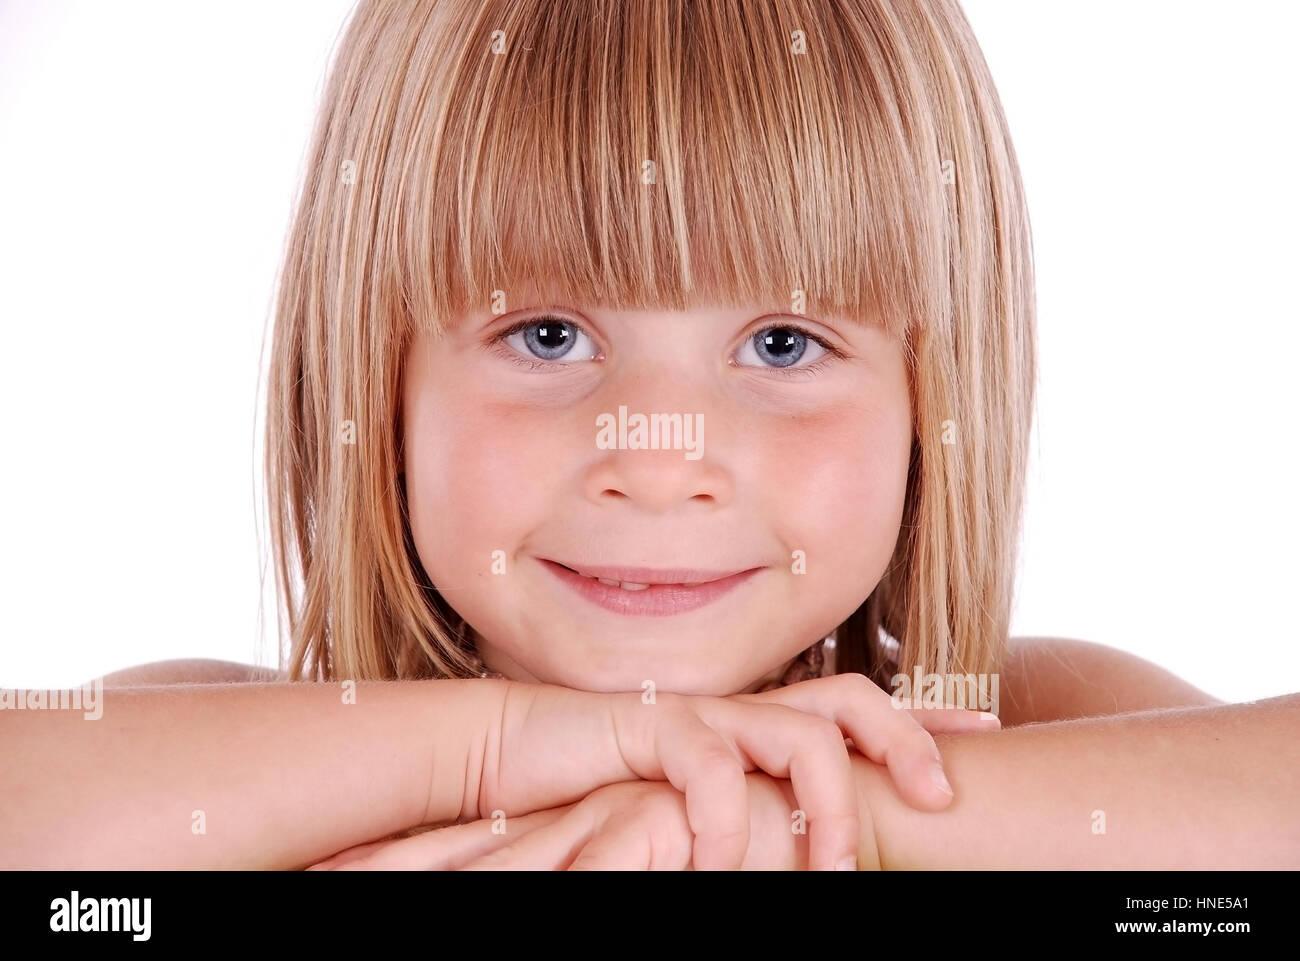 model release blondes maedchen 5 jahre im portrait blond girl 5 stock photo 133691881 alamy. Black Bedroom Furniture Sets. Home Design Ideas